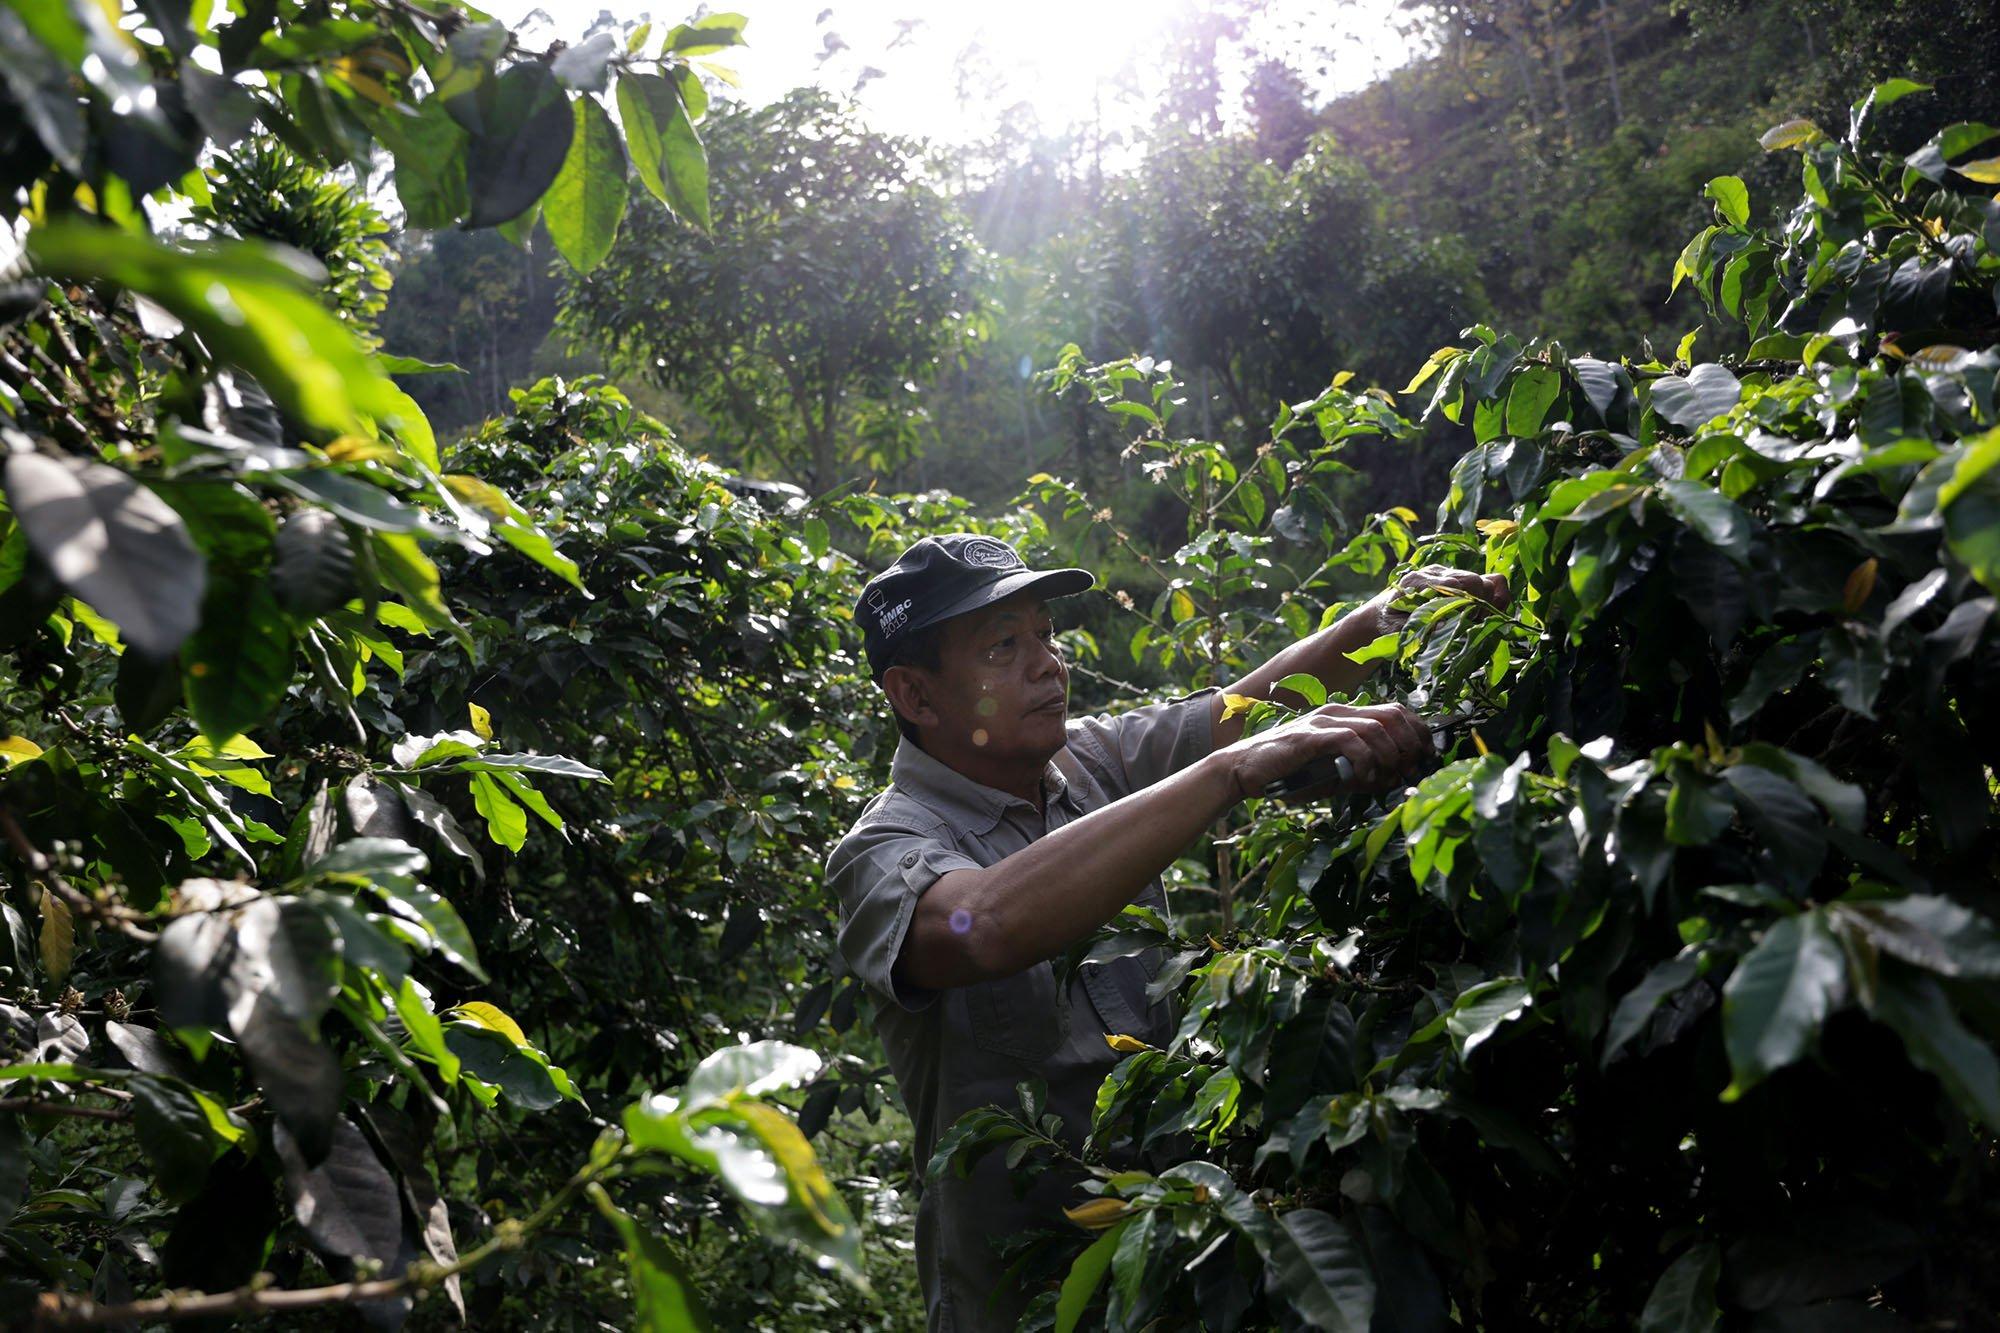 \r\nSlamet Prayoga pemilik Malabar Mountain Coffee melihat kondisi biji kopi di kebunnya, Malabar, Bandung, Jawa Barat (15/11/2019).